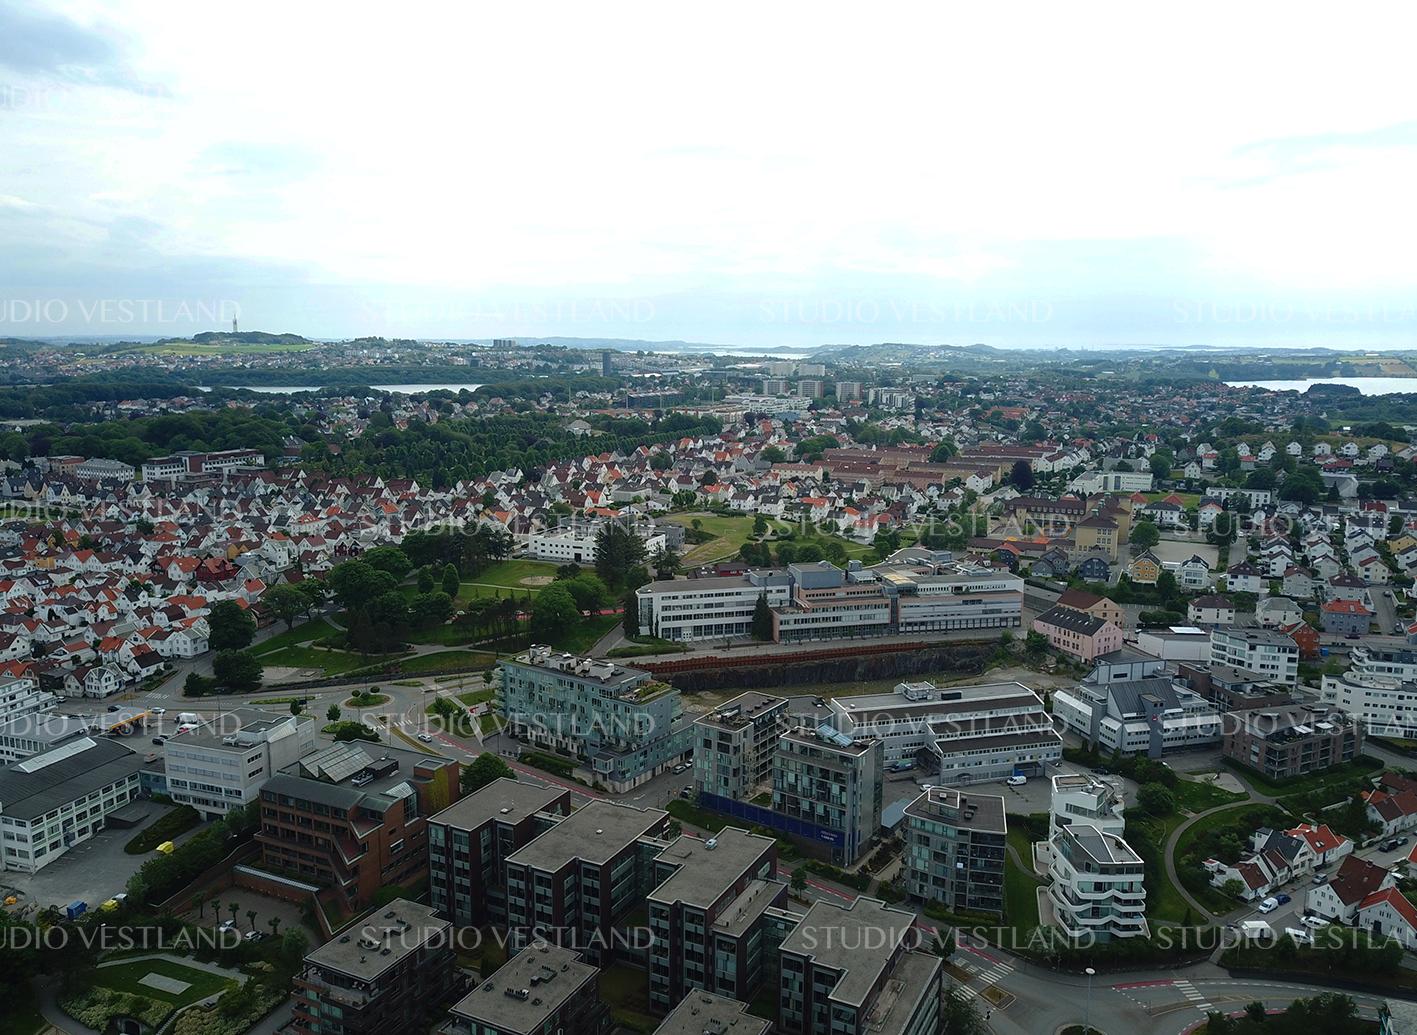 Studio Vestland - Stavanger 14